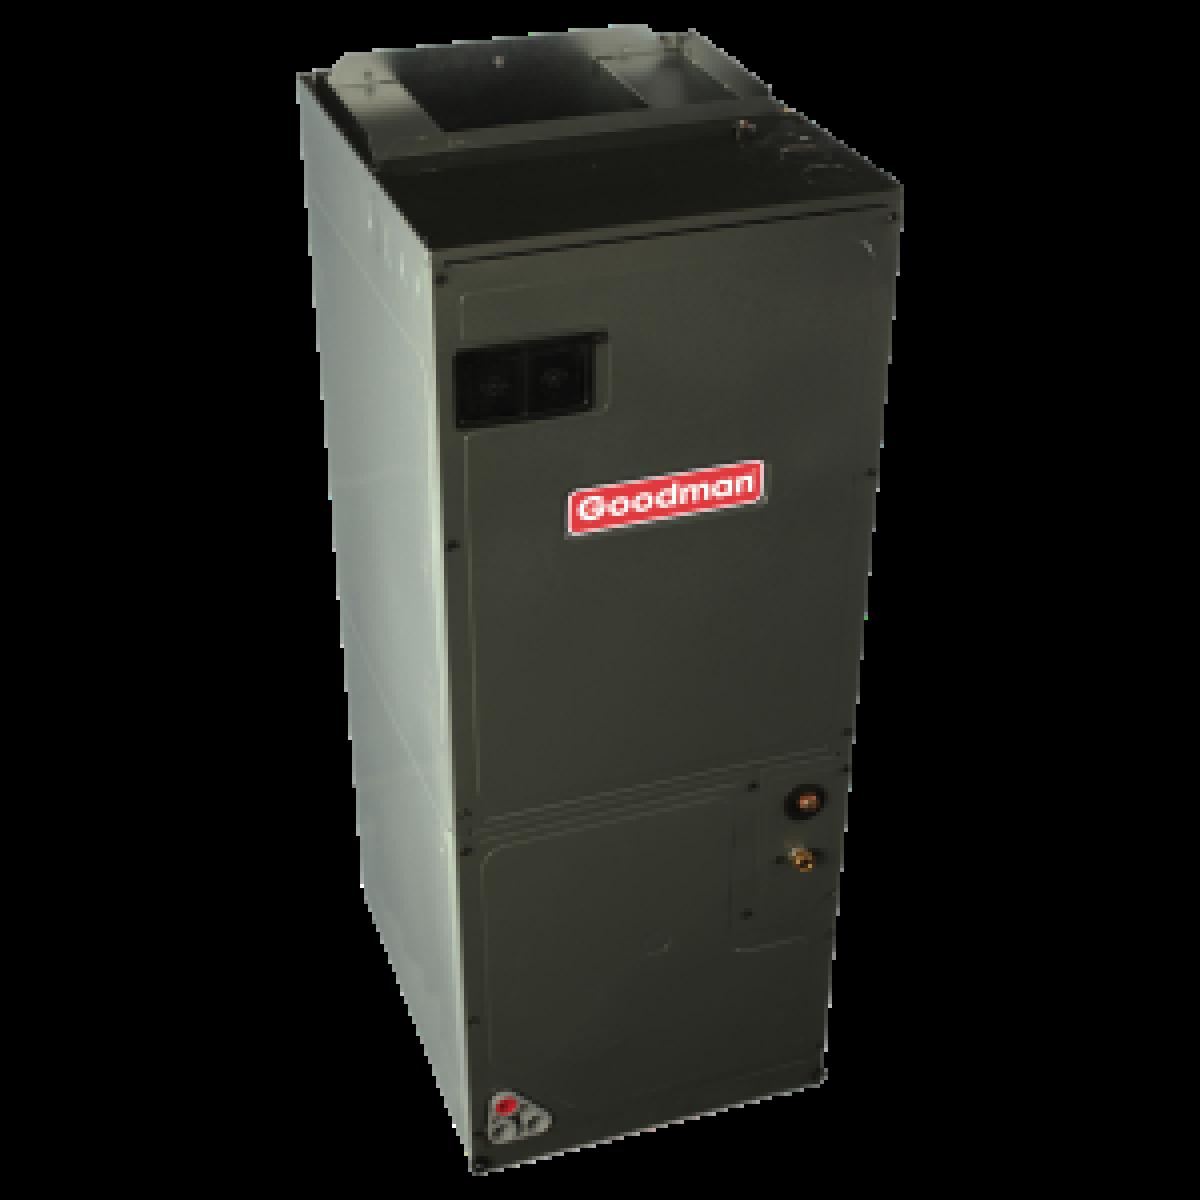 Goodman 2 5 Ton 14 Seer Heat Pump Split System